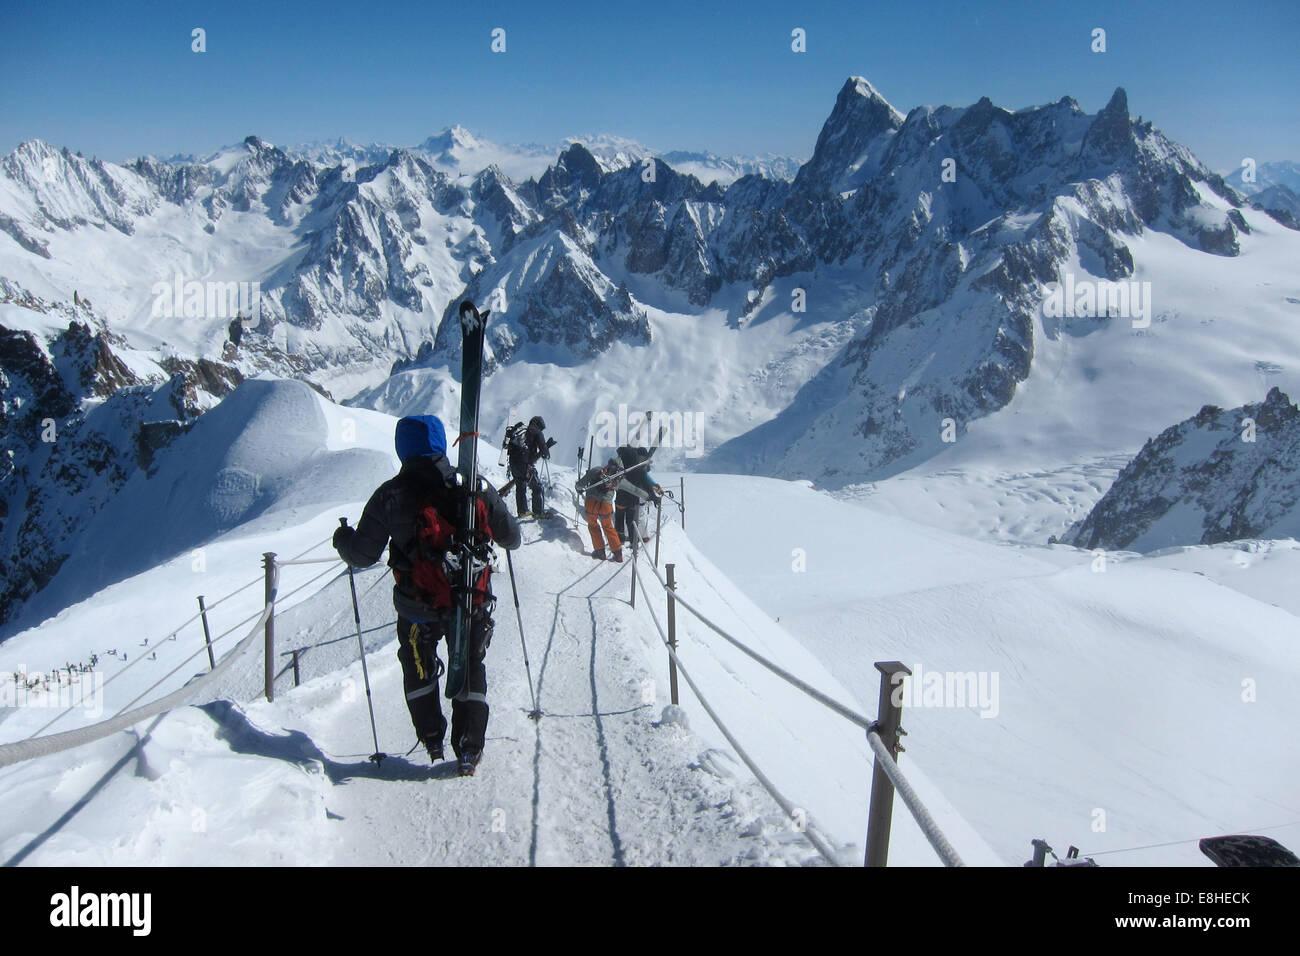 Aiguille du Midi ridge towards Vallee Blanche, Chamonix, France - Stock Image